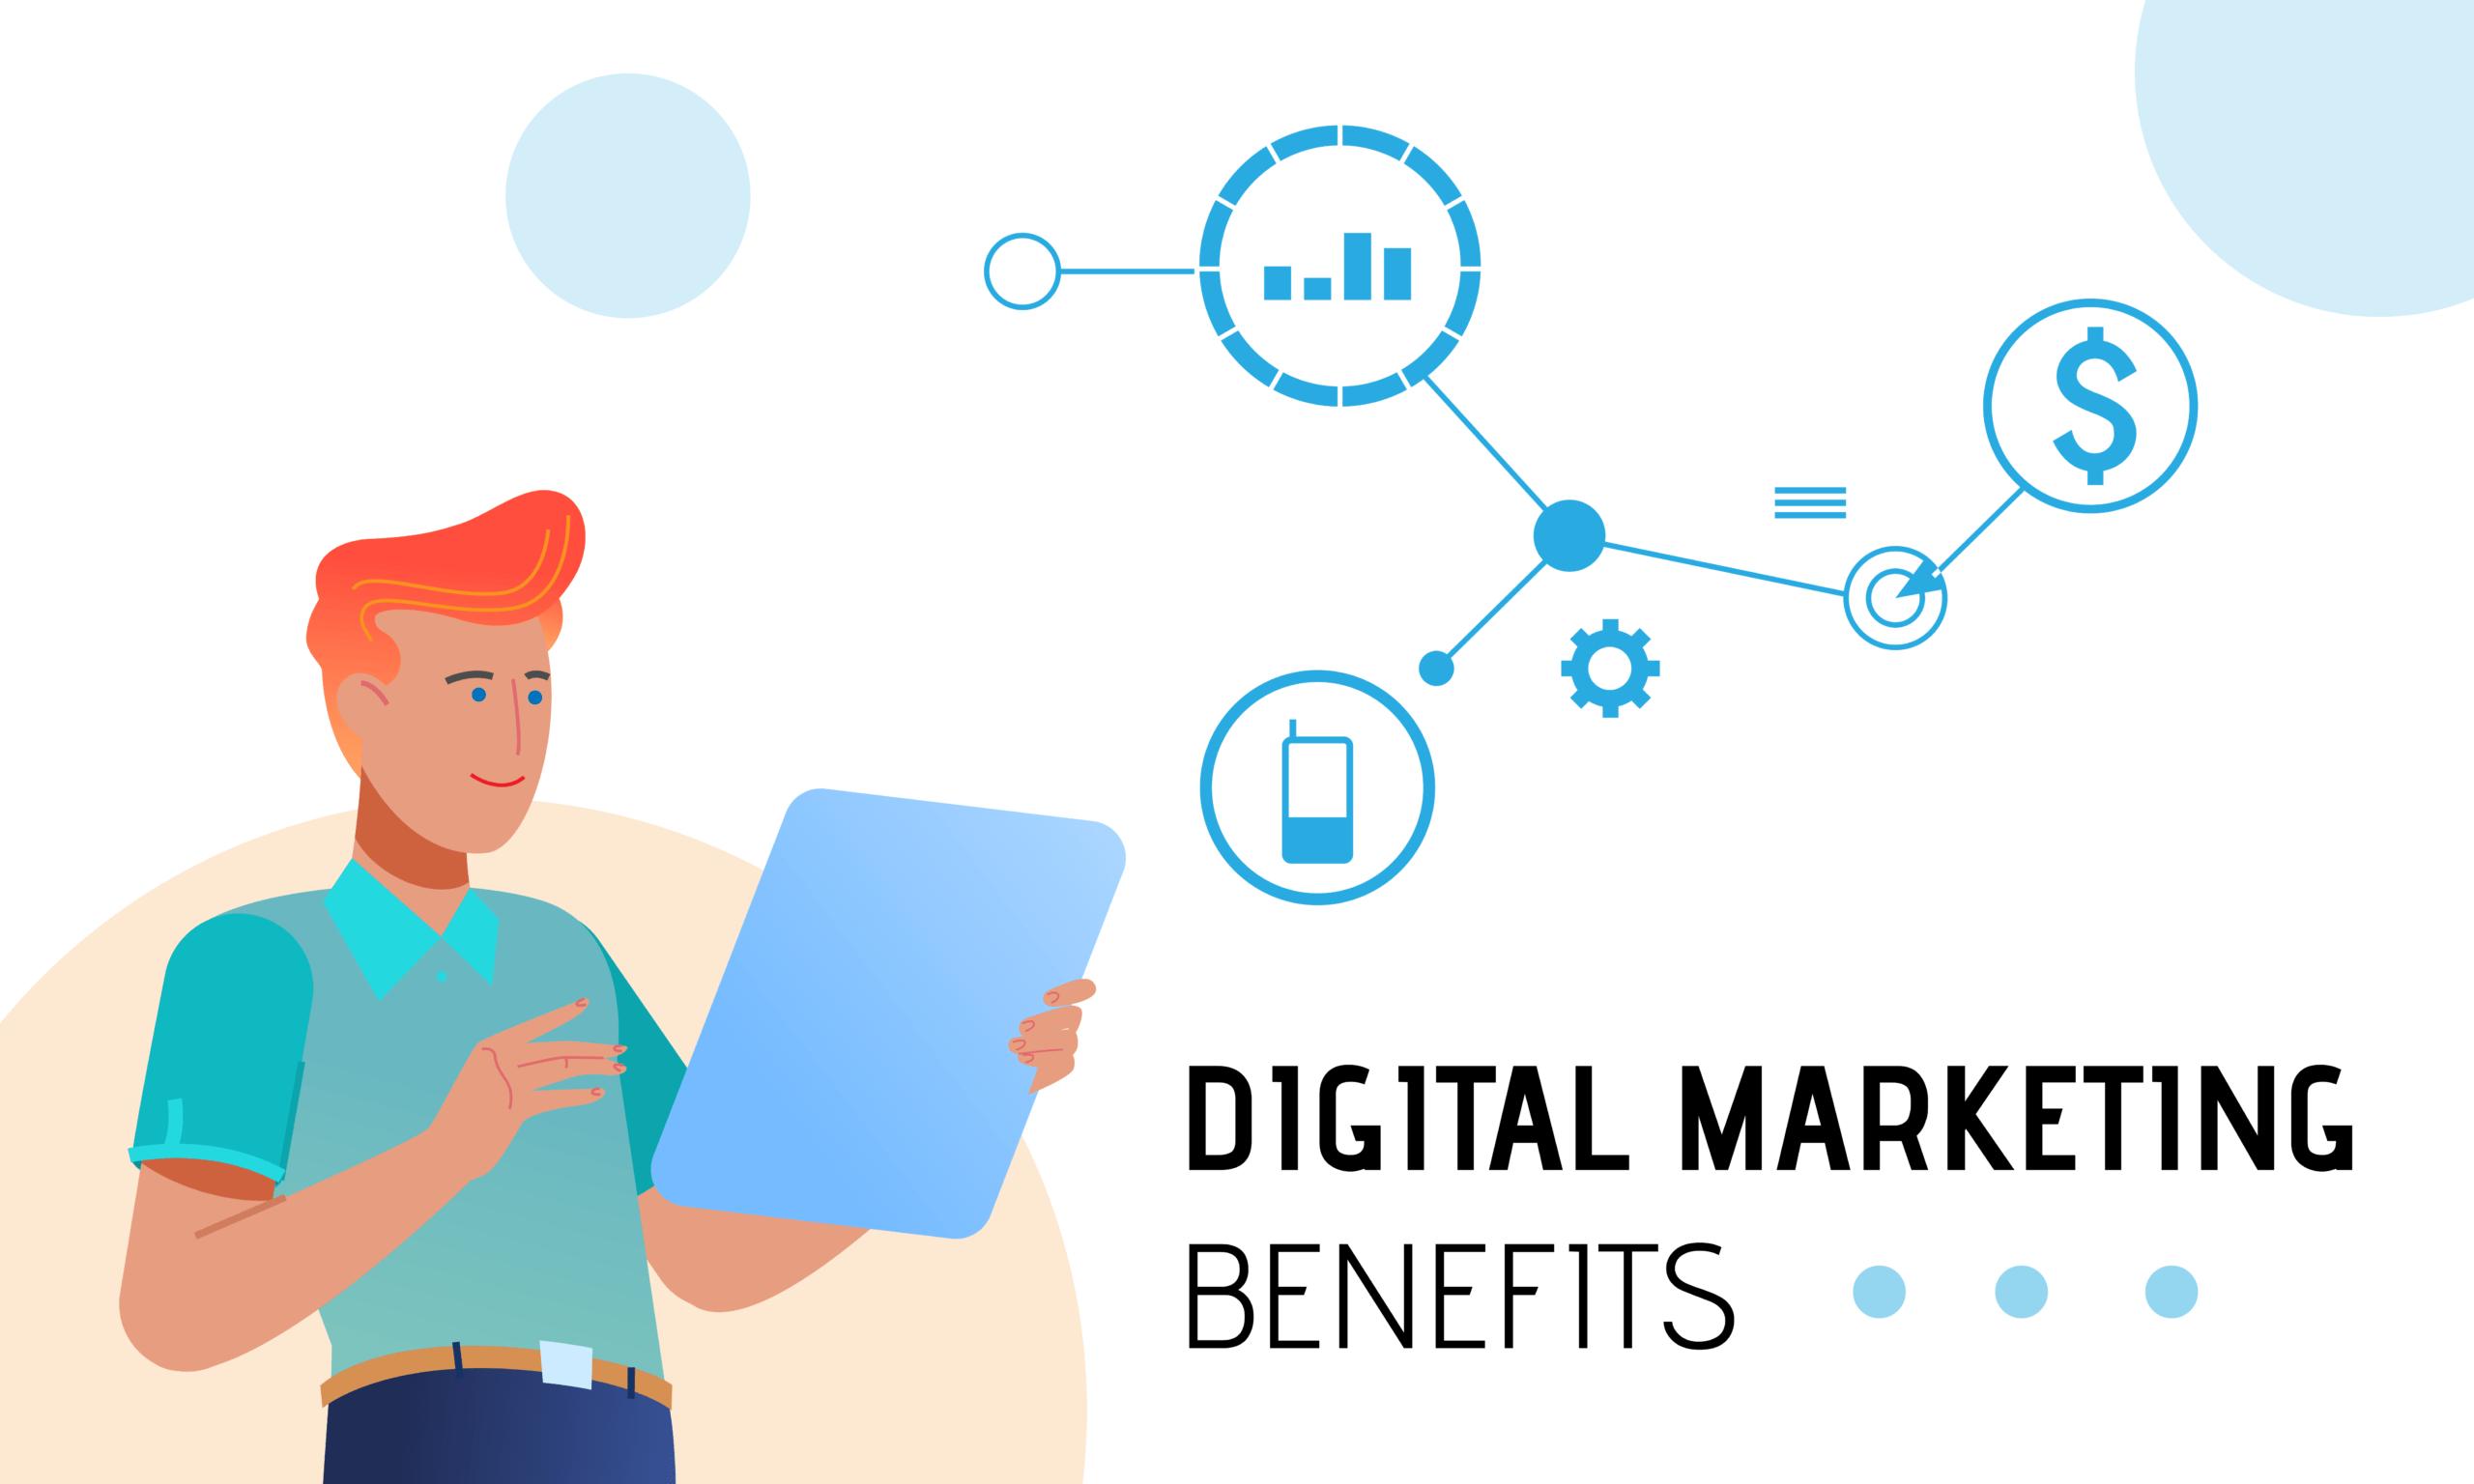 Digital Marketing Benefits Cover Photo